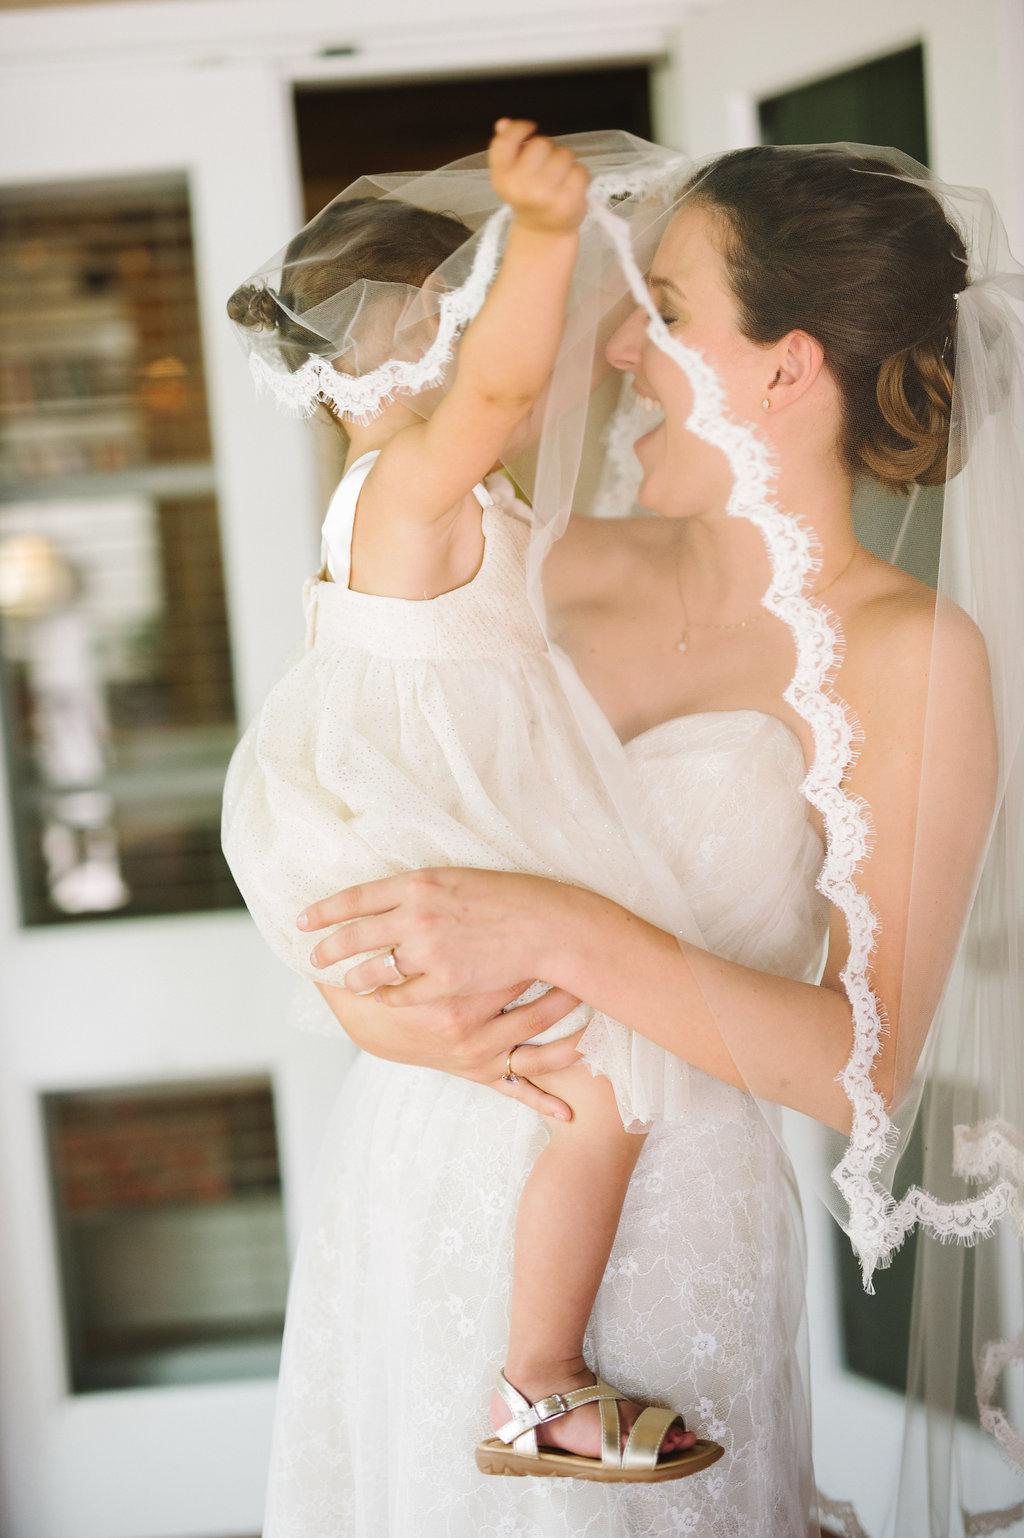 meagan-and-brenden-rach-loves-troy-photography-ivory-and-beau-bridal-boutqiue-ti-adora-wedding-dress-gold-lace-wedding-dress-savannah-wedding-planner-savannah-weddings-oldfield-plantation-wedding-savannah-florist-13.jpg